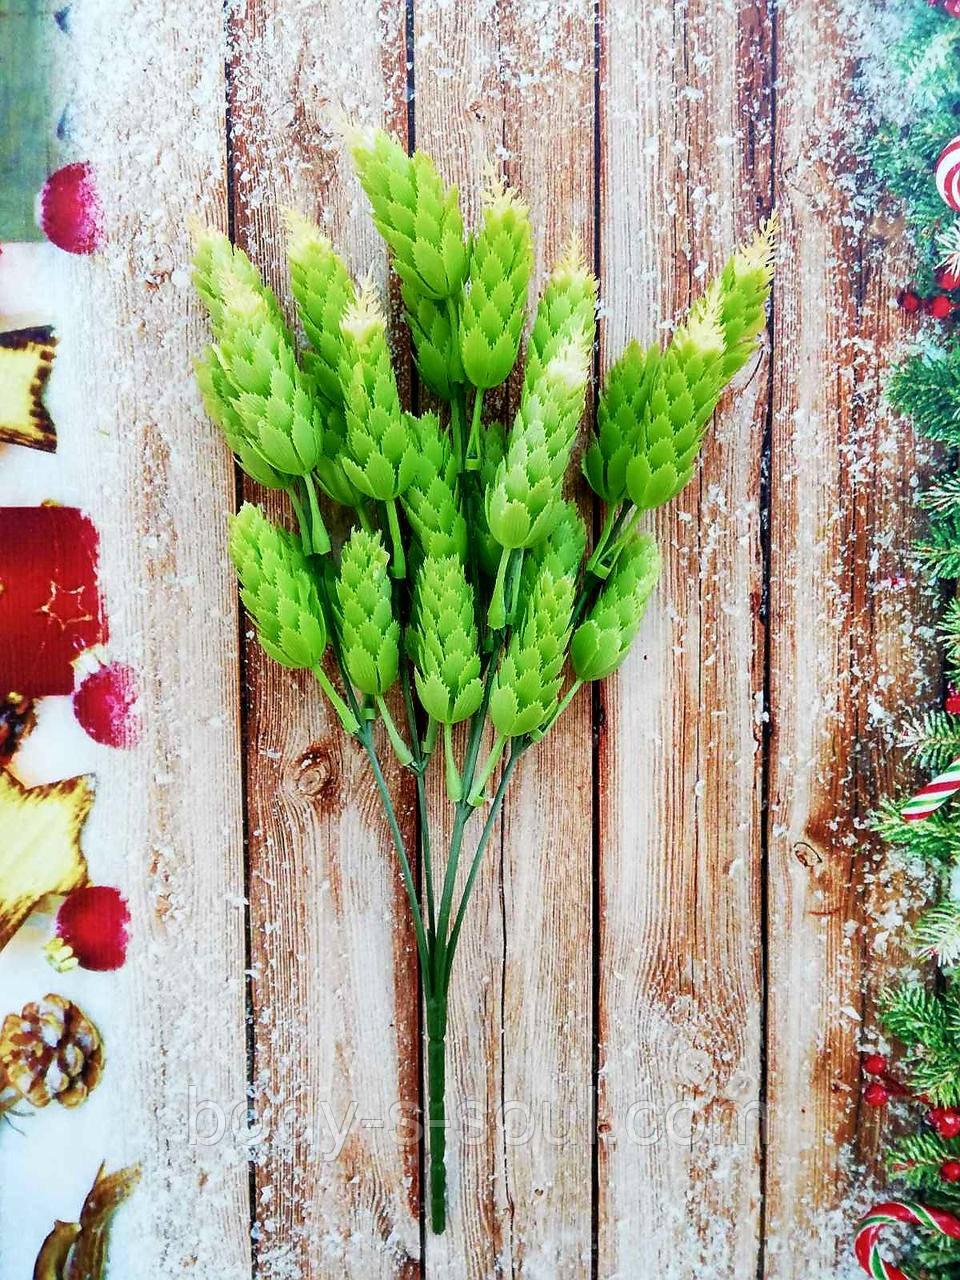 Хмель зеленый желтый пик,длинна 30 см